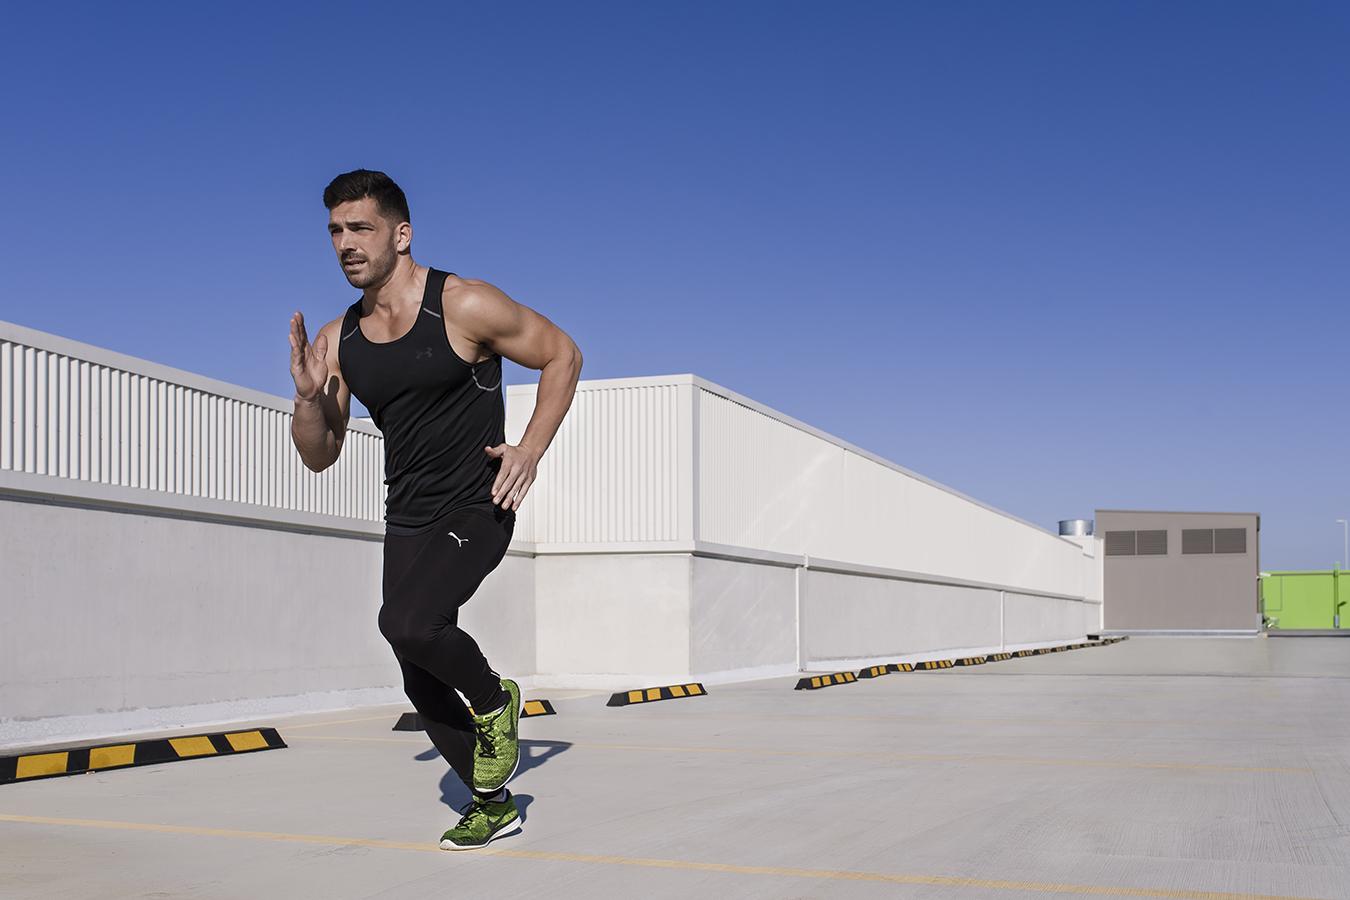 Jon sprinting on Gold Coast open roof car park